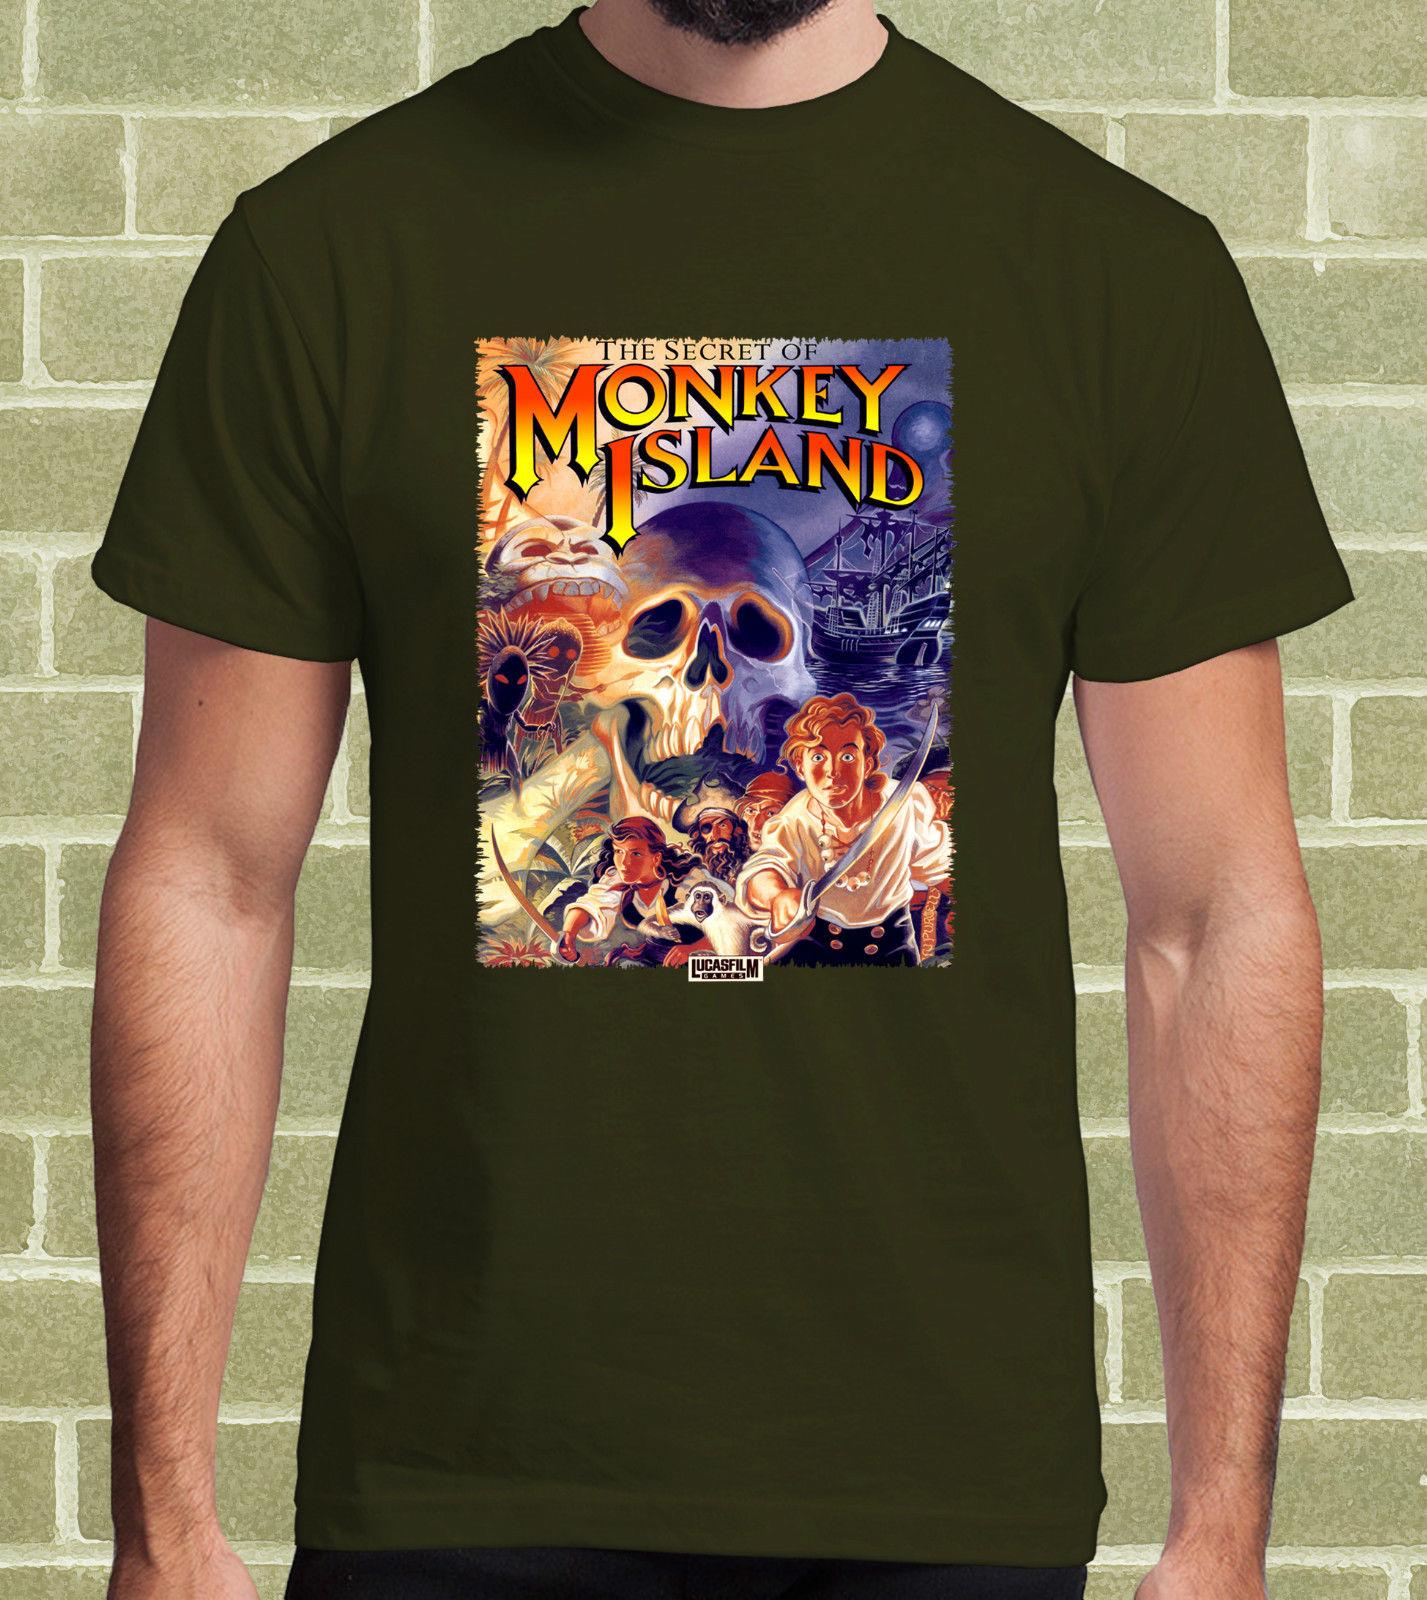 gildan-the-secret-of-monkey-island-fontbvideogame-b-font-arcade-1990-t-shirt-per-uomo-e-bambino-mens